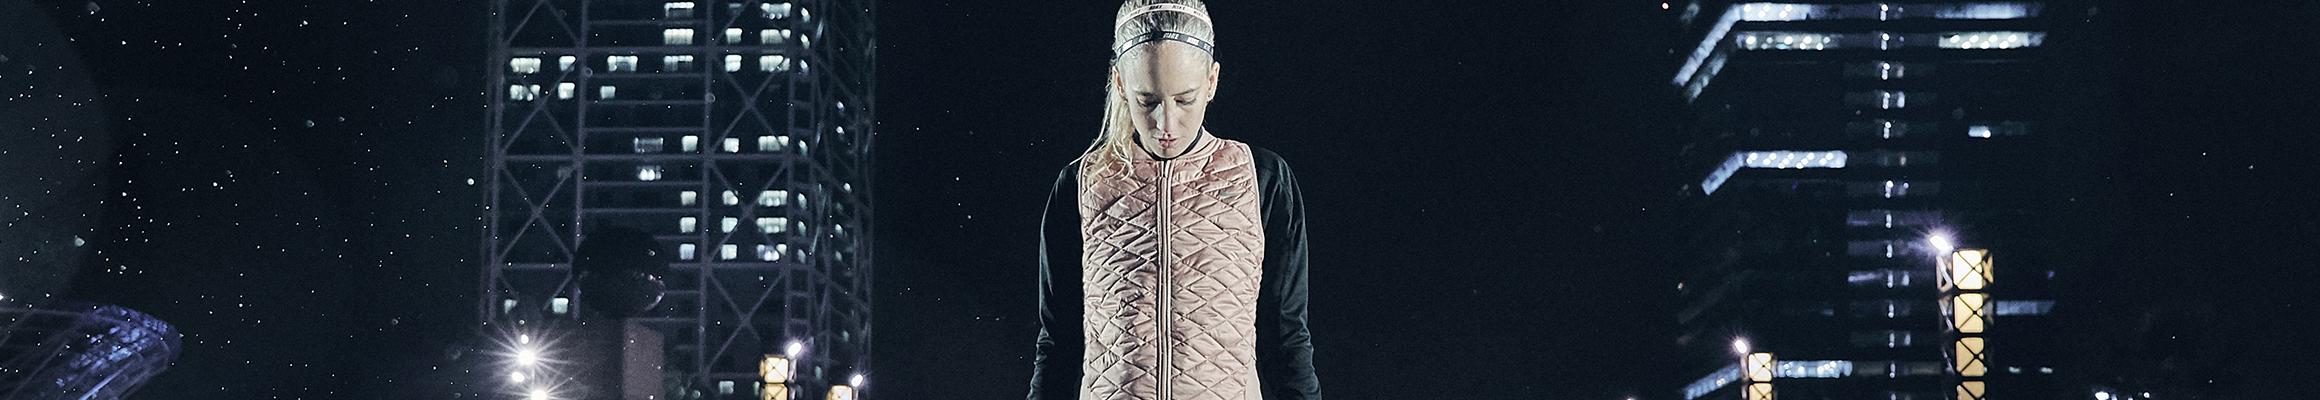 Lady Finisher | Nike Ambassador x Sprinter